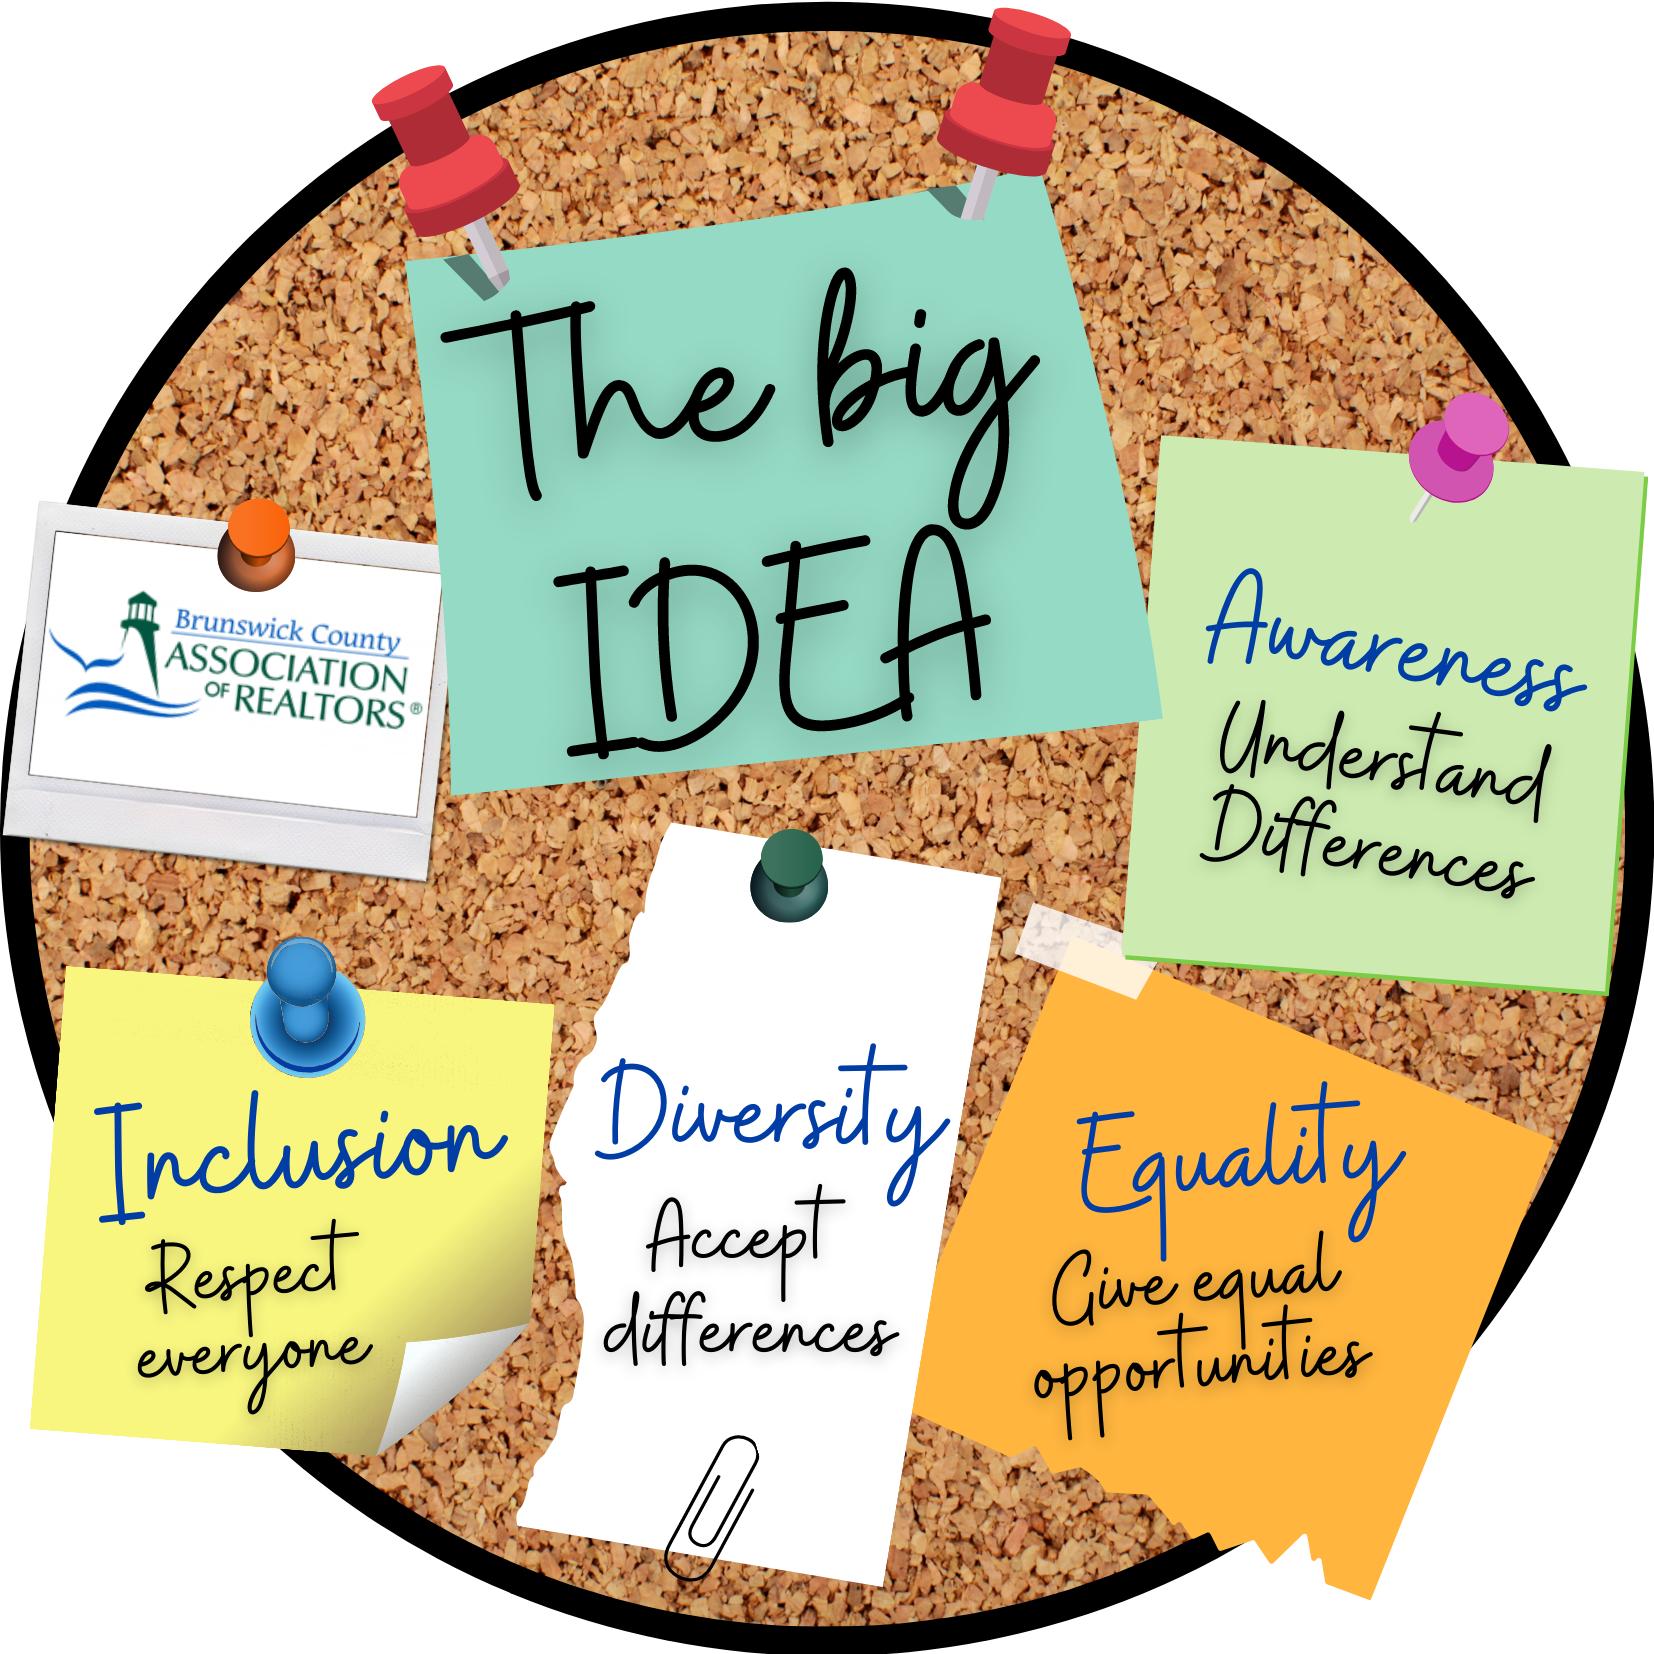 The big IDEA logo